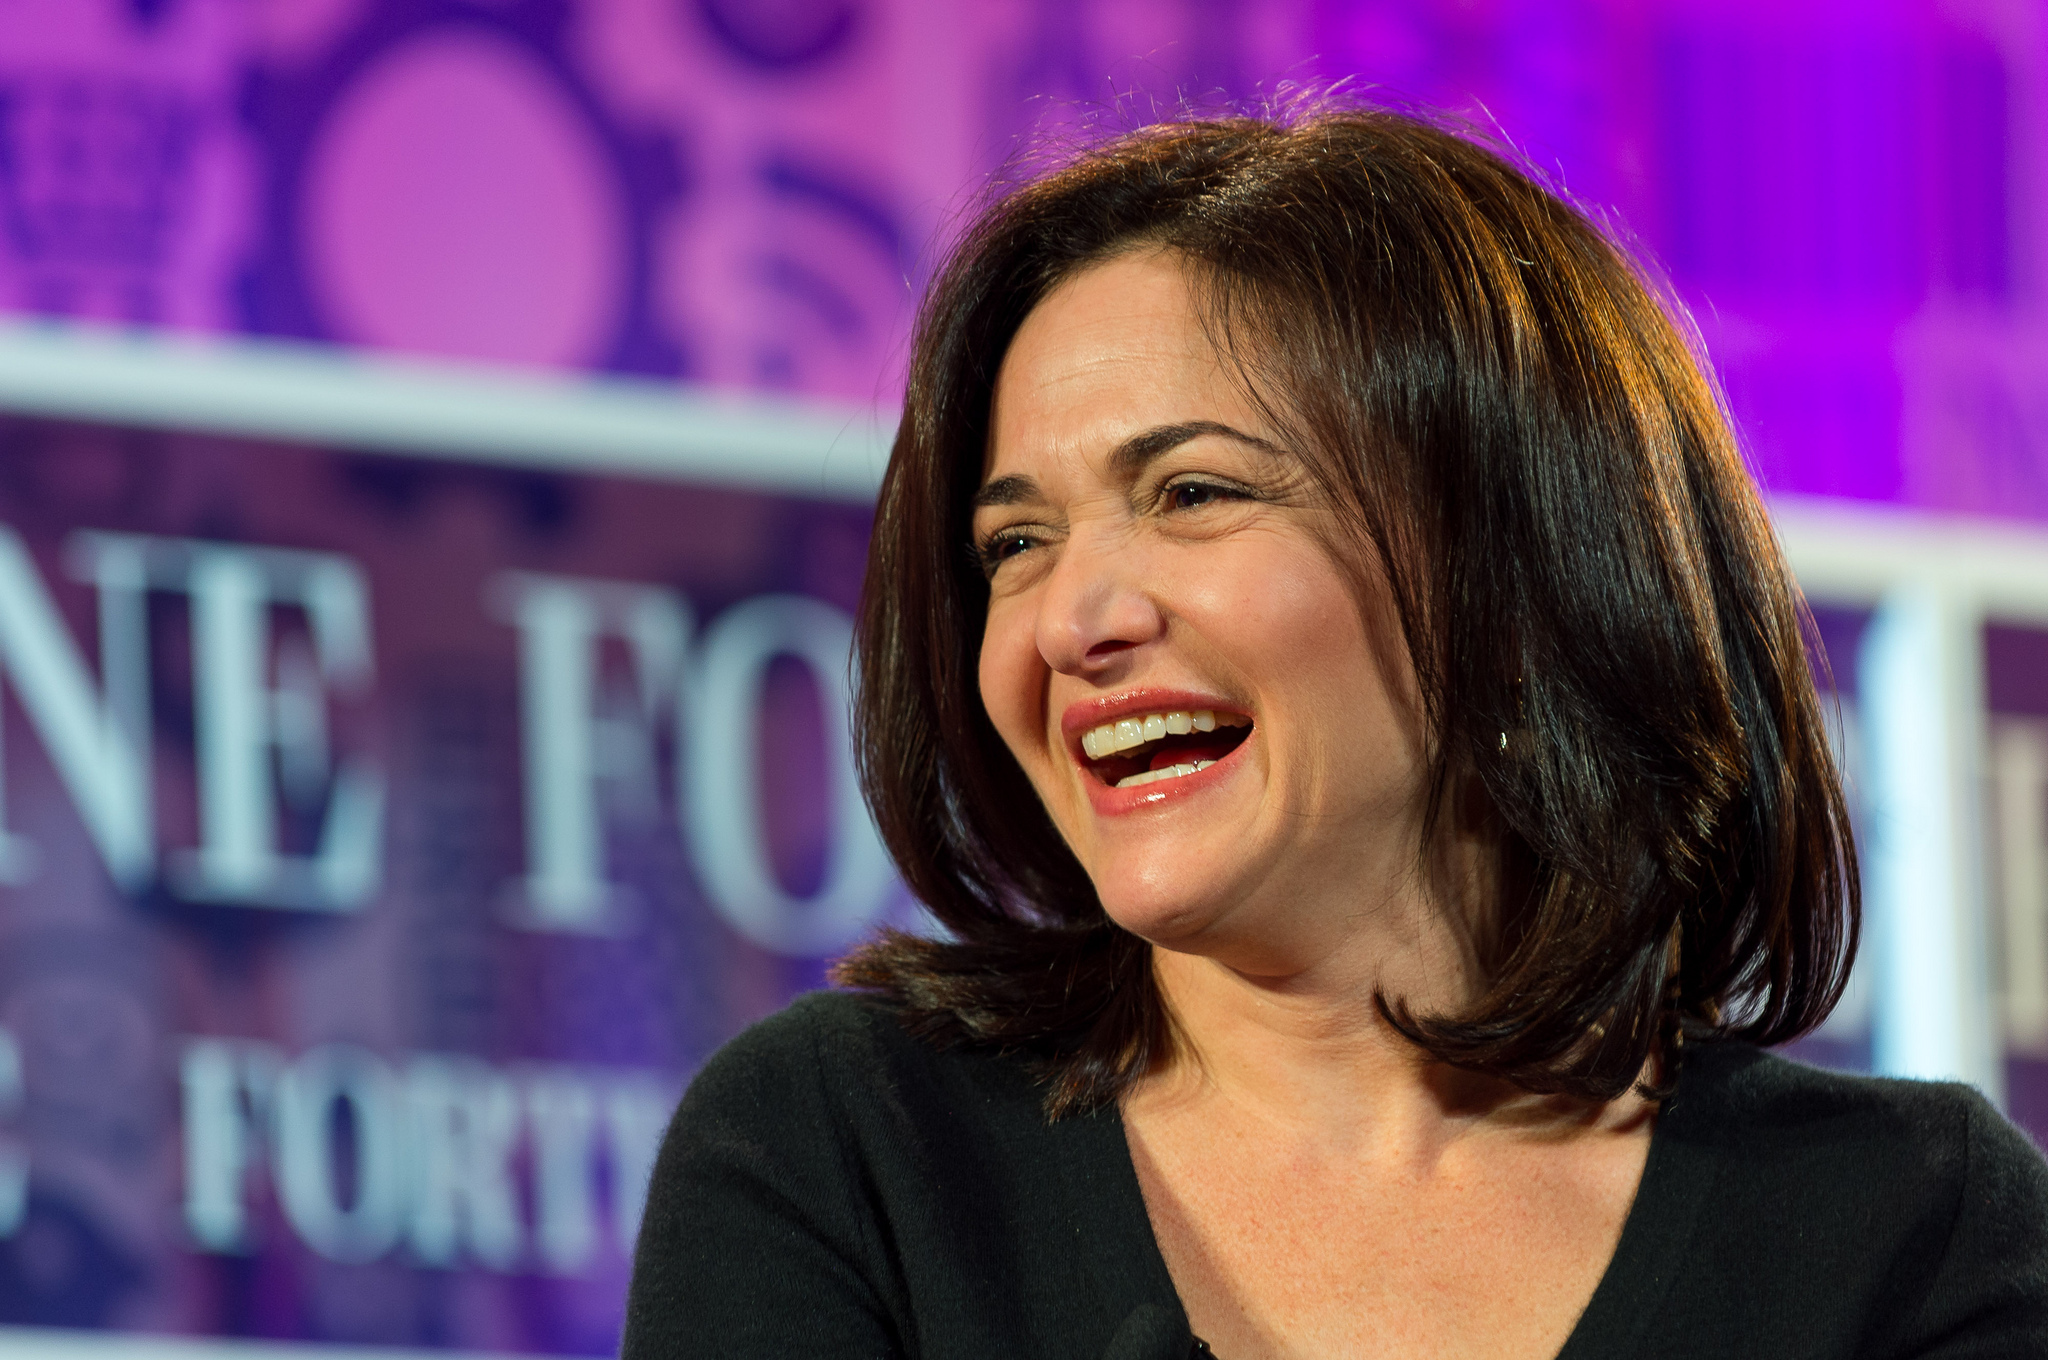 LeanIn.org founder Sheryl Sandberg. Photo credit: Fortune Live Media [ CC BY-NC-ND 2.0 ],  via Flickr